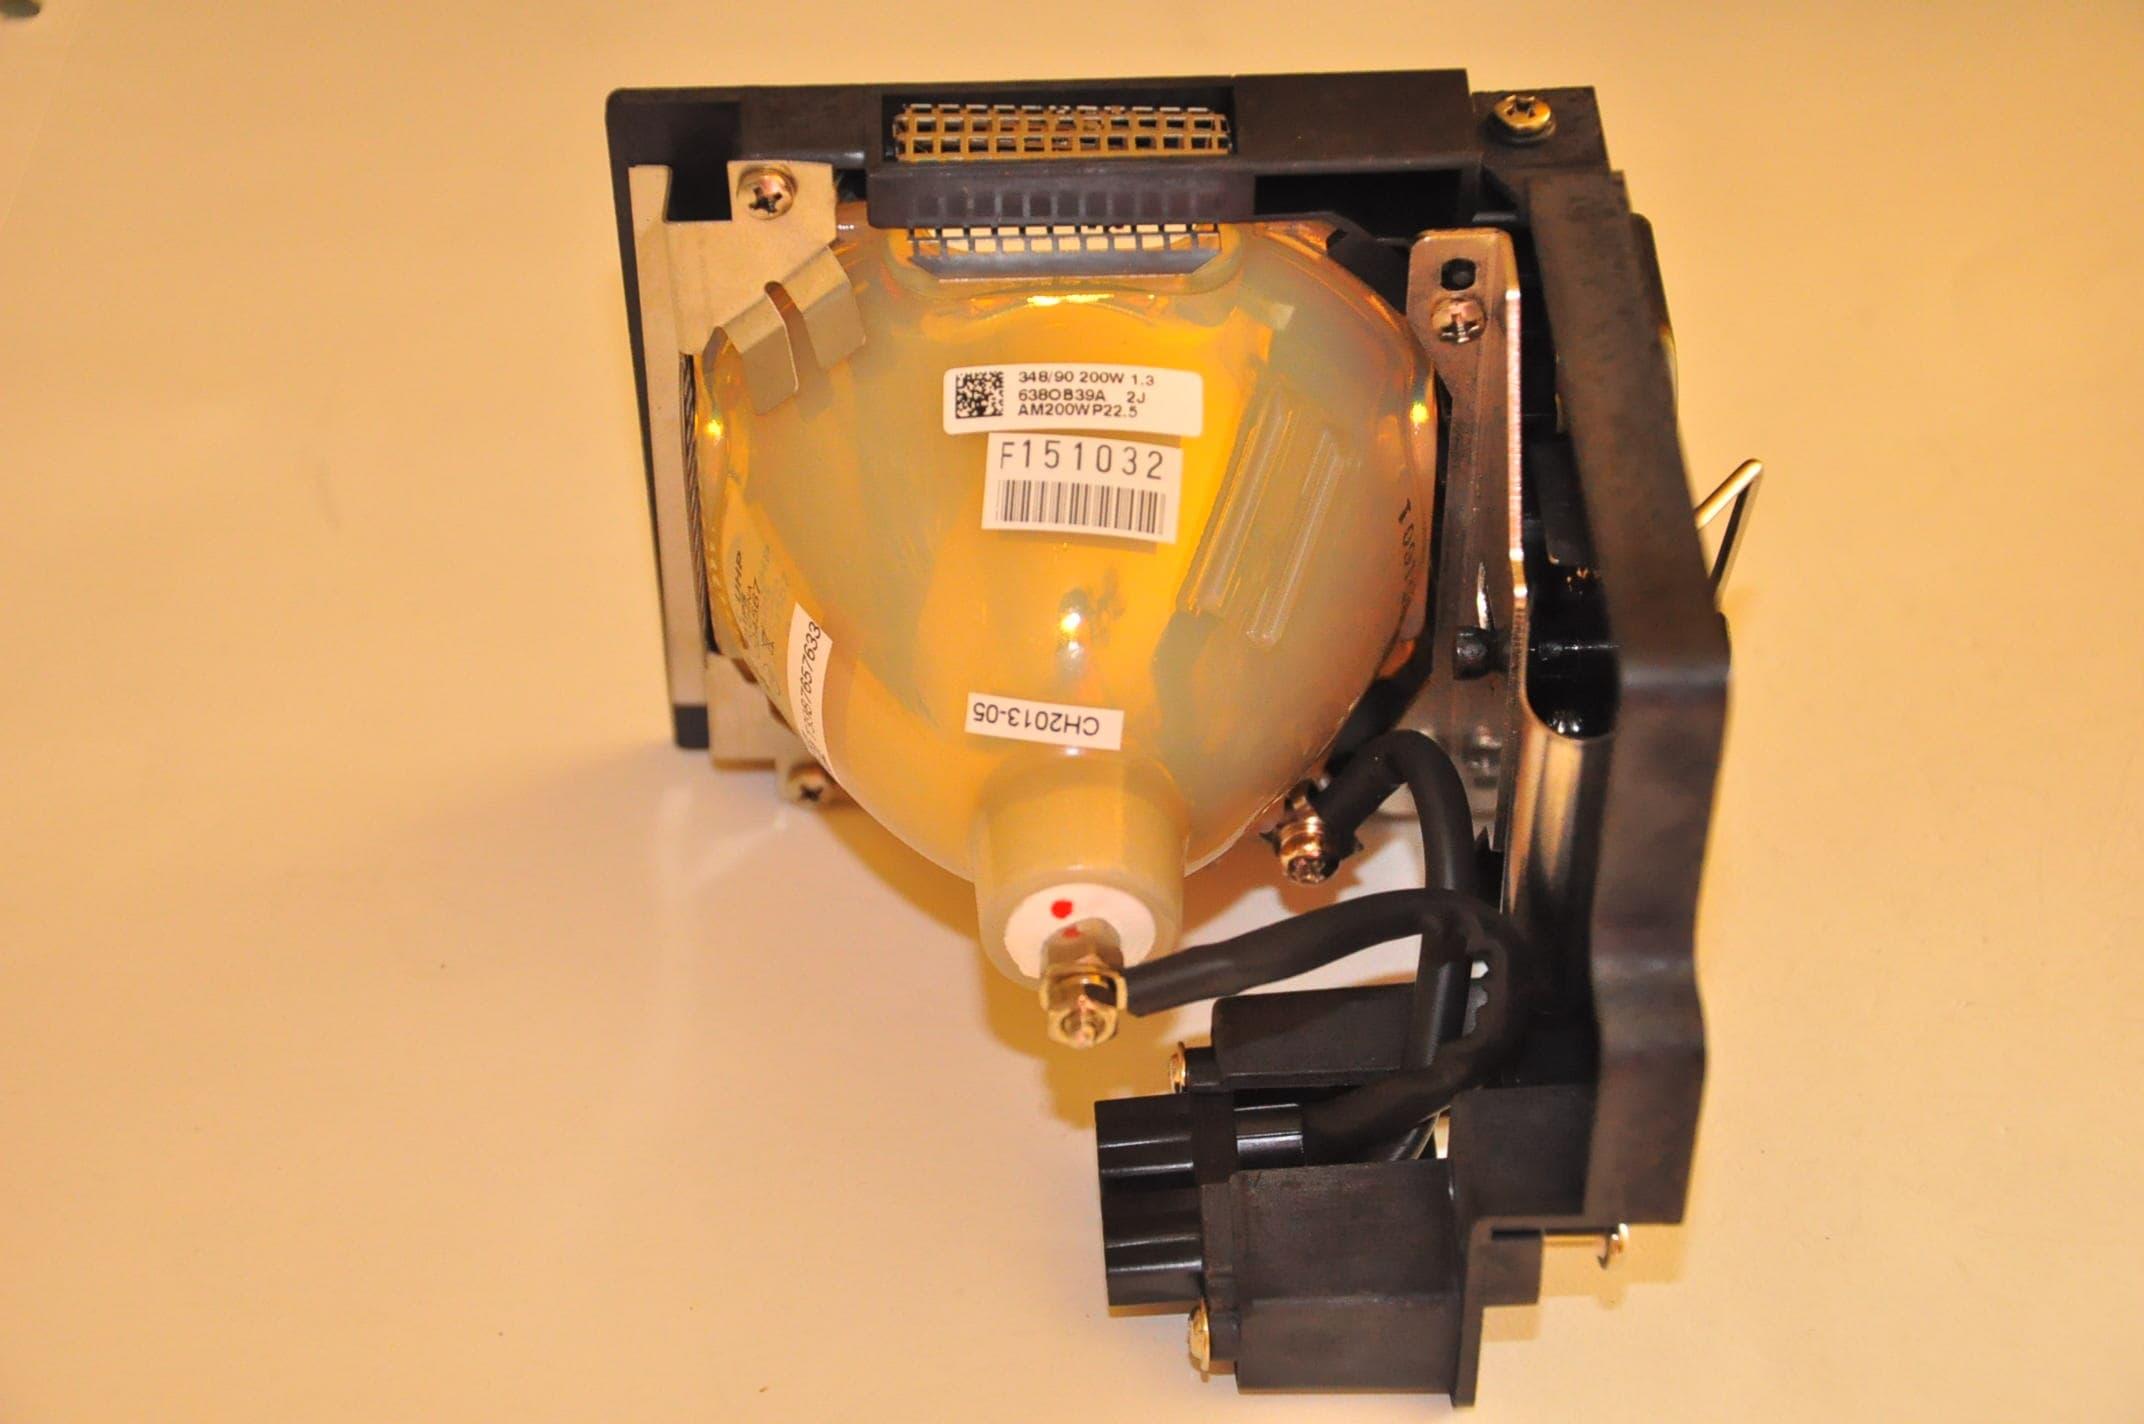 LMP39 UHP200W 1.3 P22.5 (4).jpg